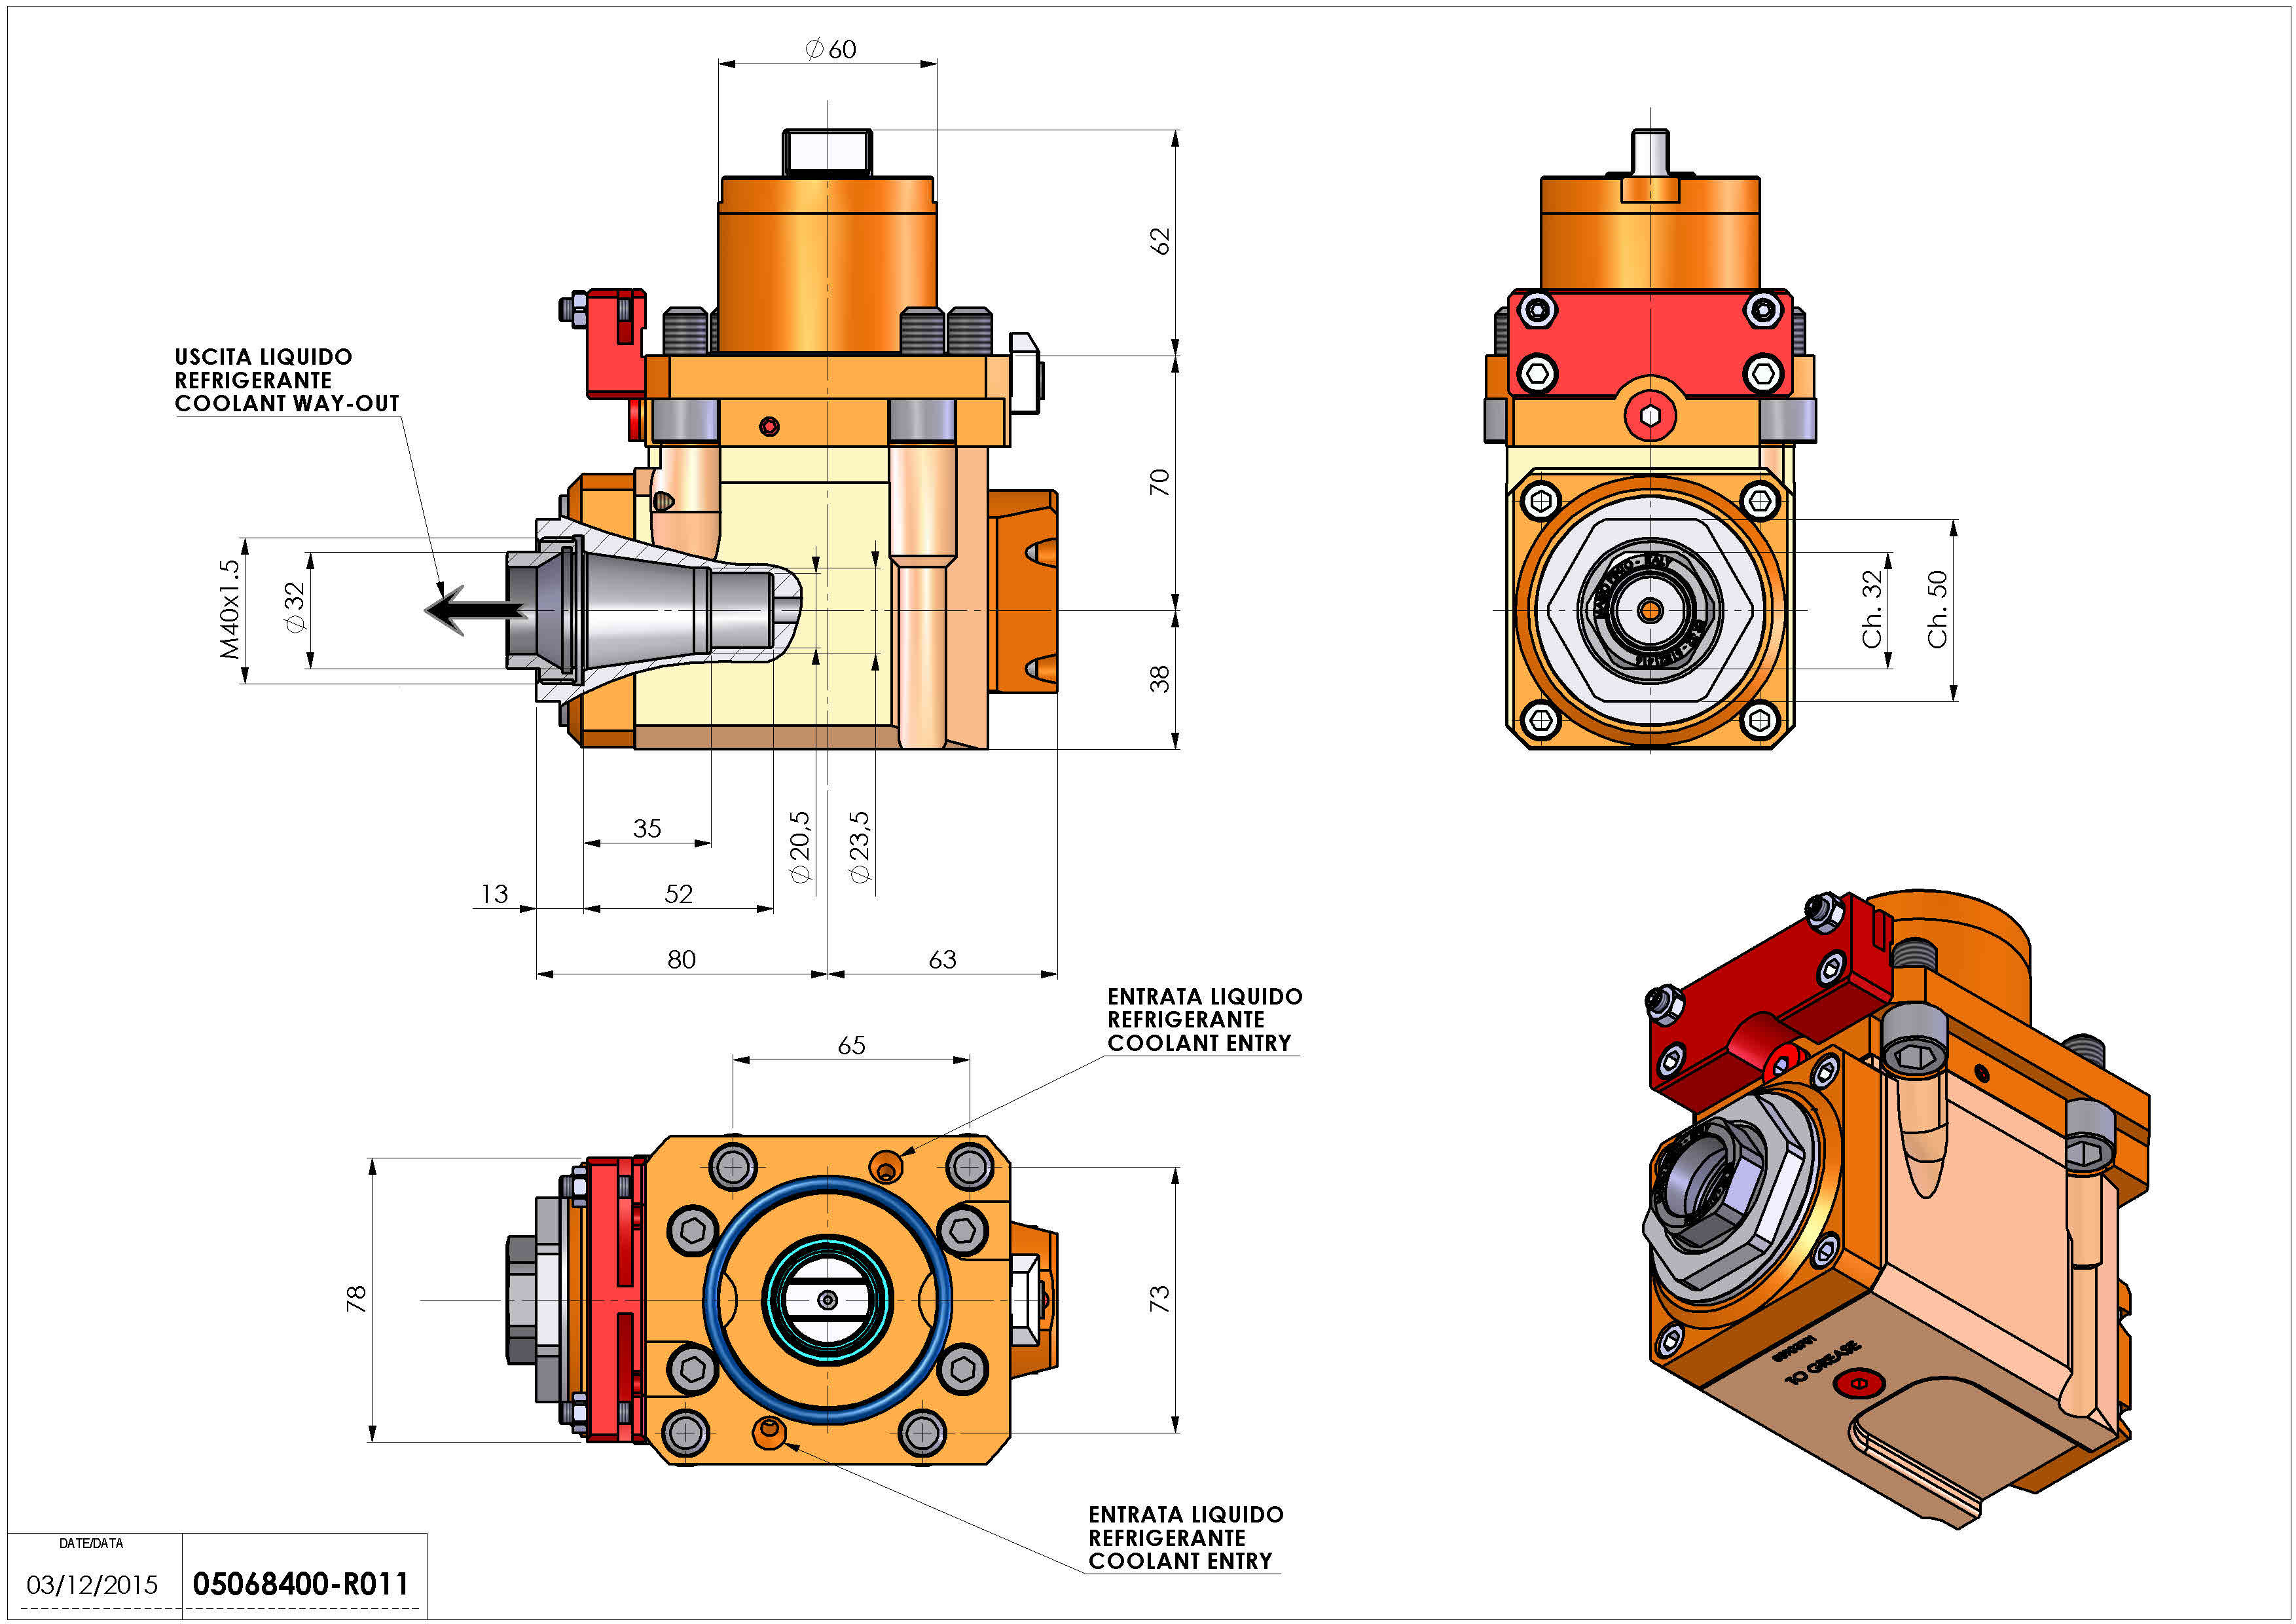 Technical image - LT-A D60 ER32F L-R RF H70 OK.